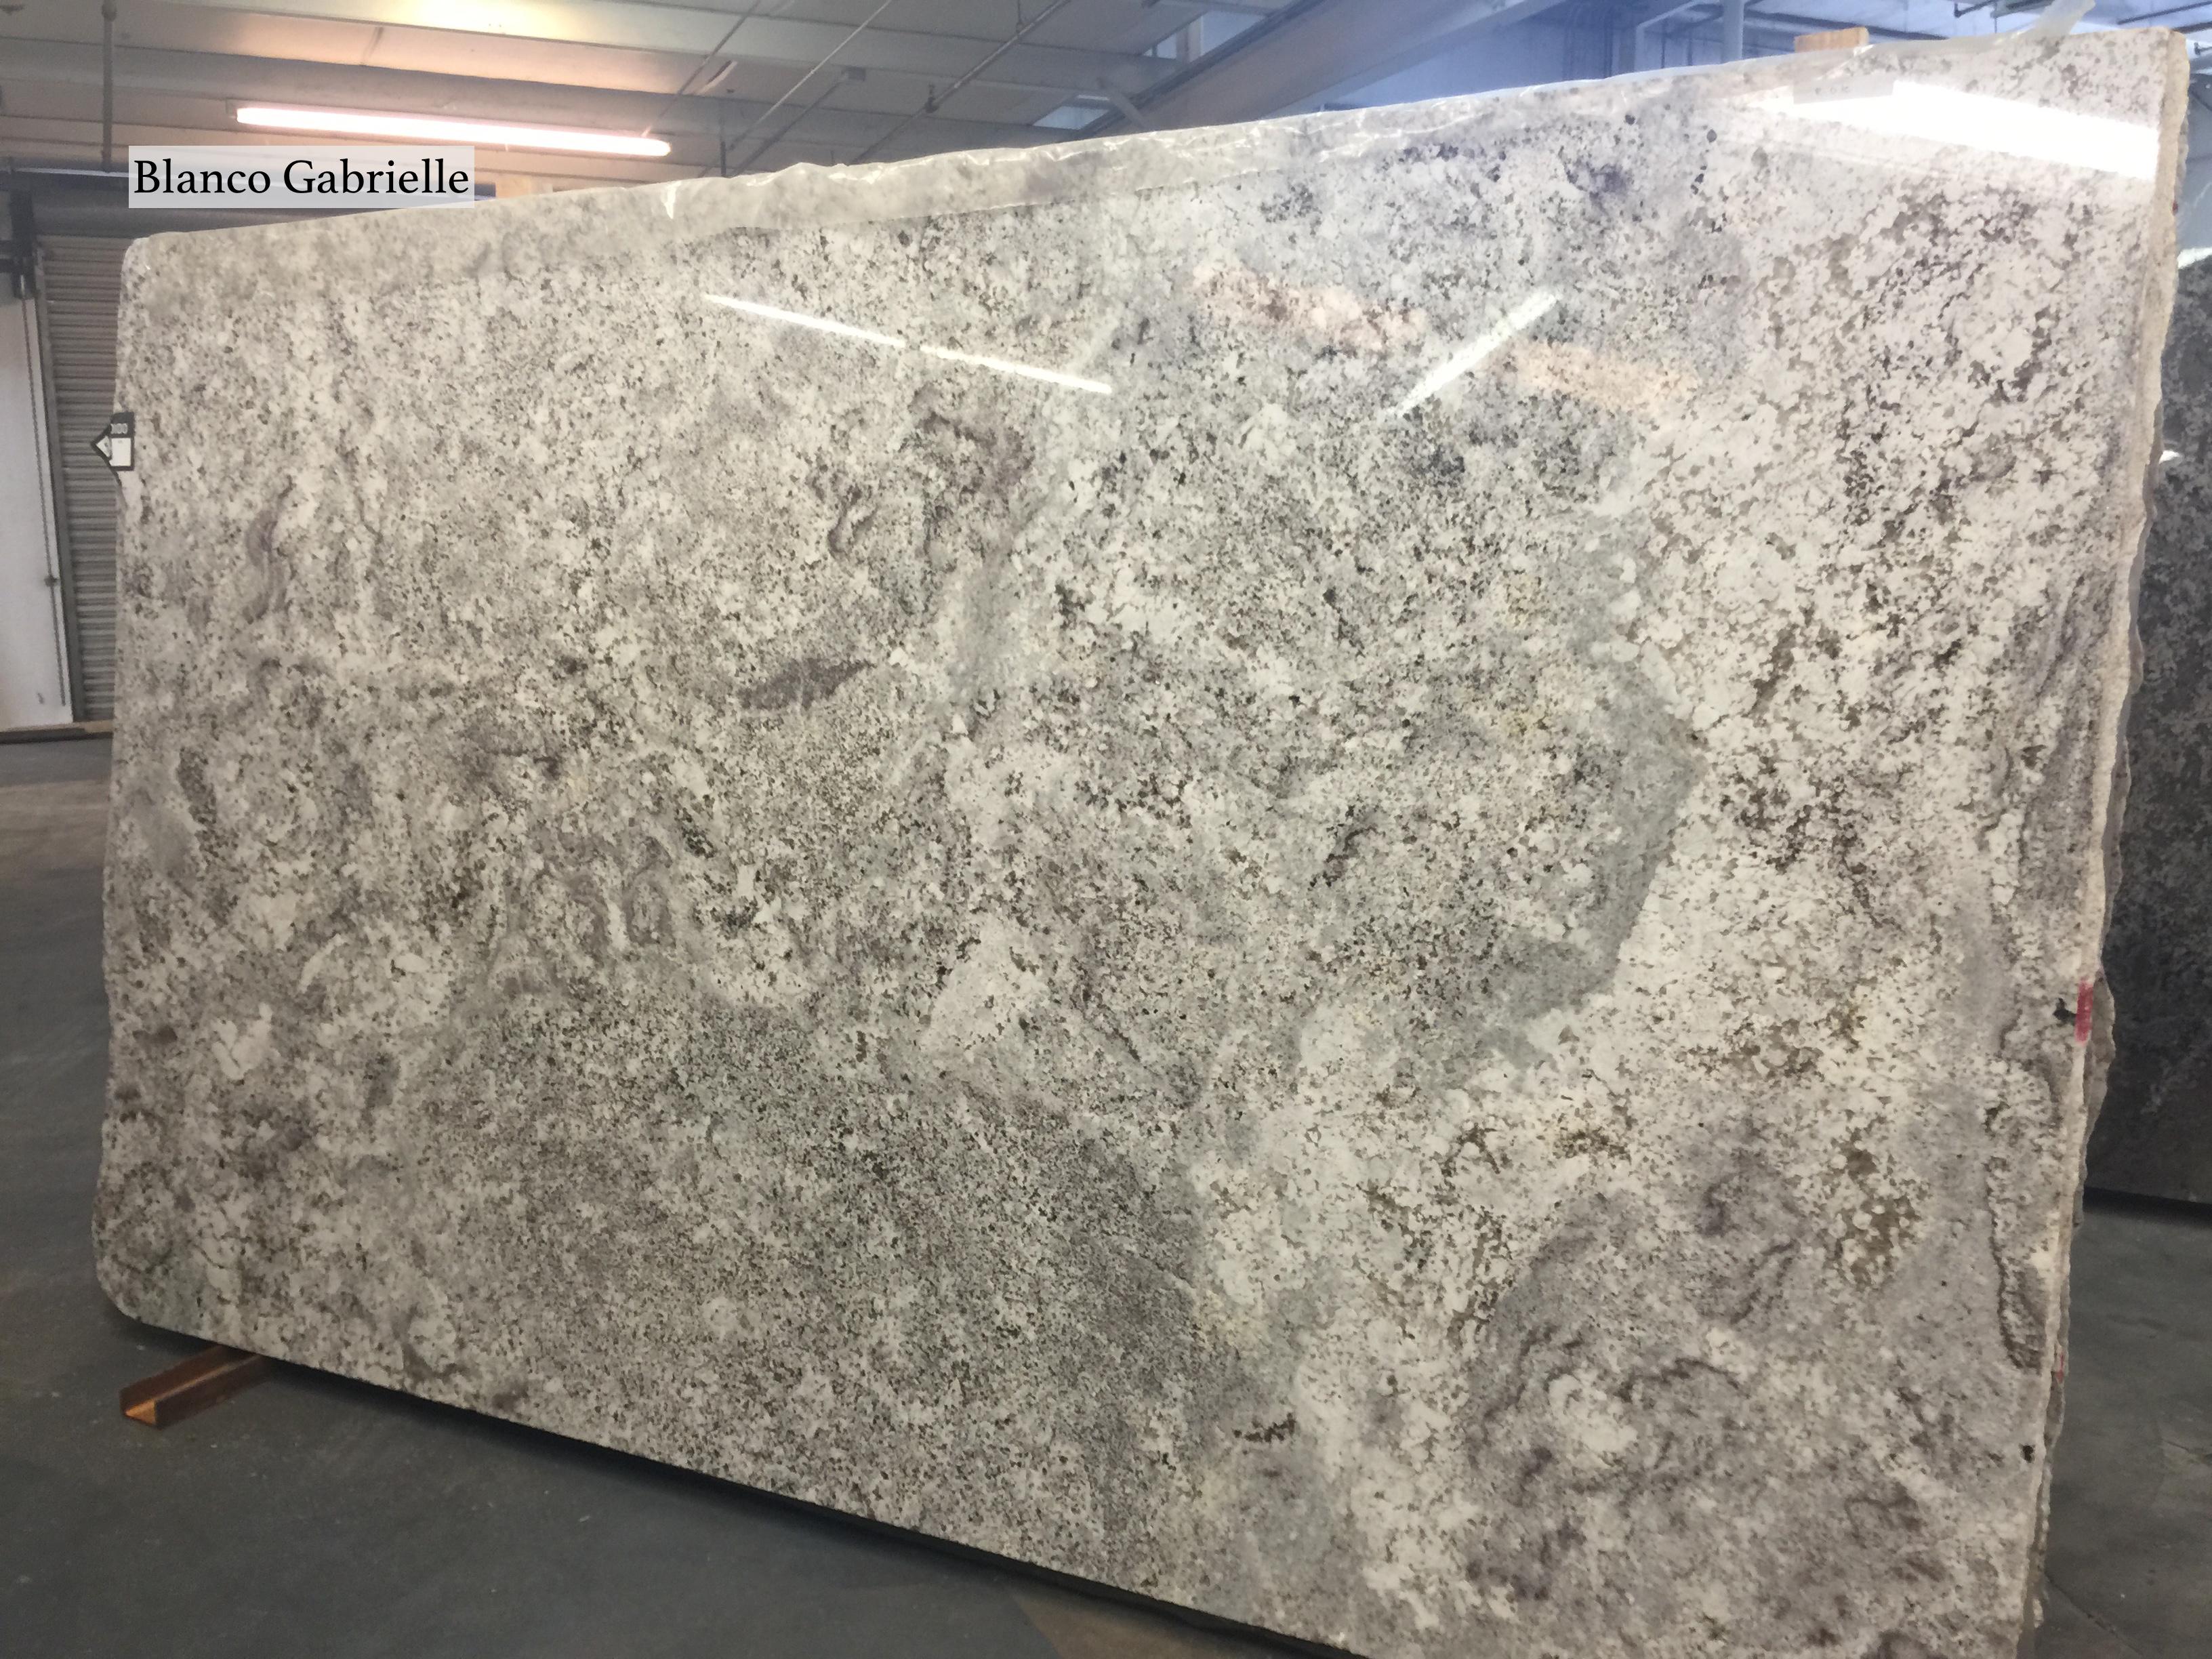 Blanco Gabrielle Granite Related Keywords & Suggestions - Blanco ...